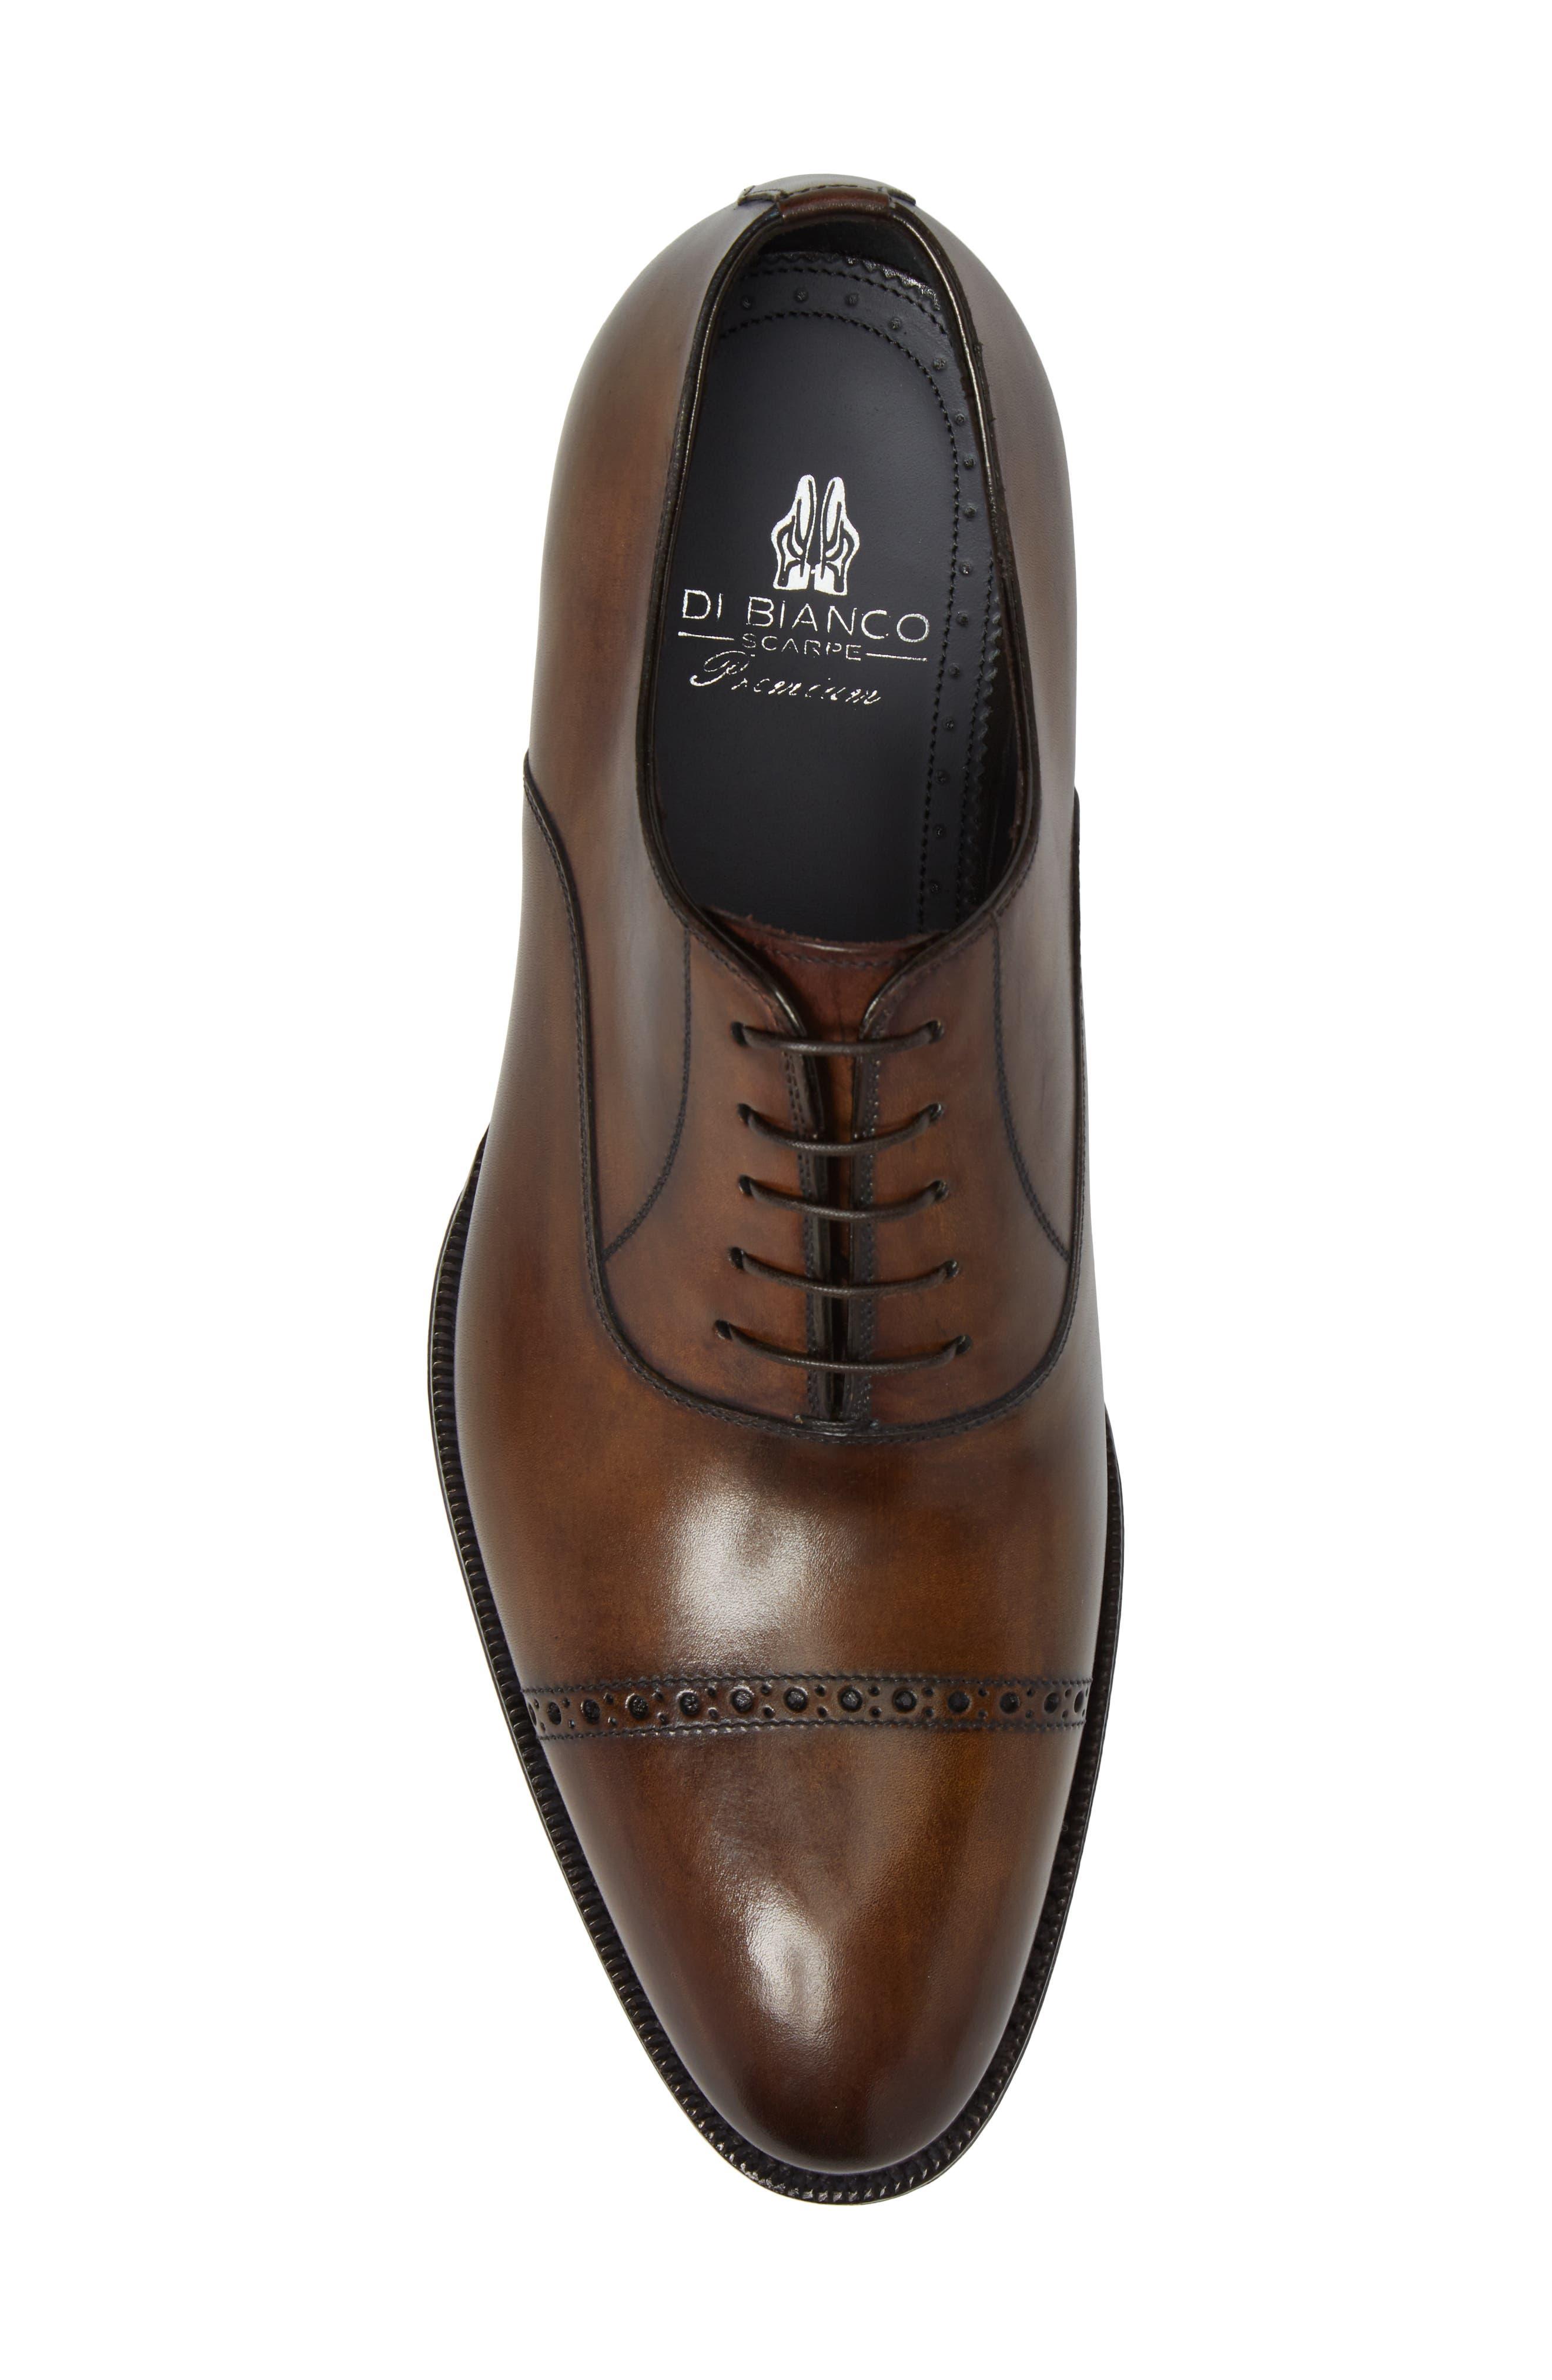 DiGallo Bianco Cap Toe Oxford,                             Alternate thumbnail 5, color,                             Zenzero Leather